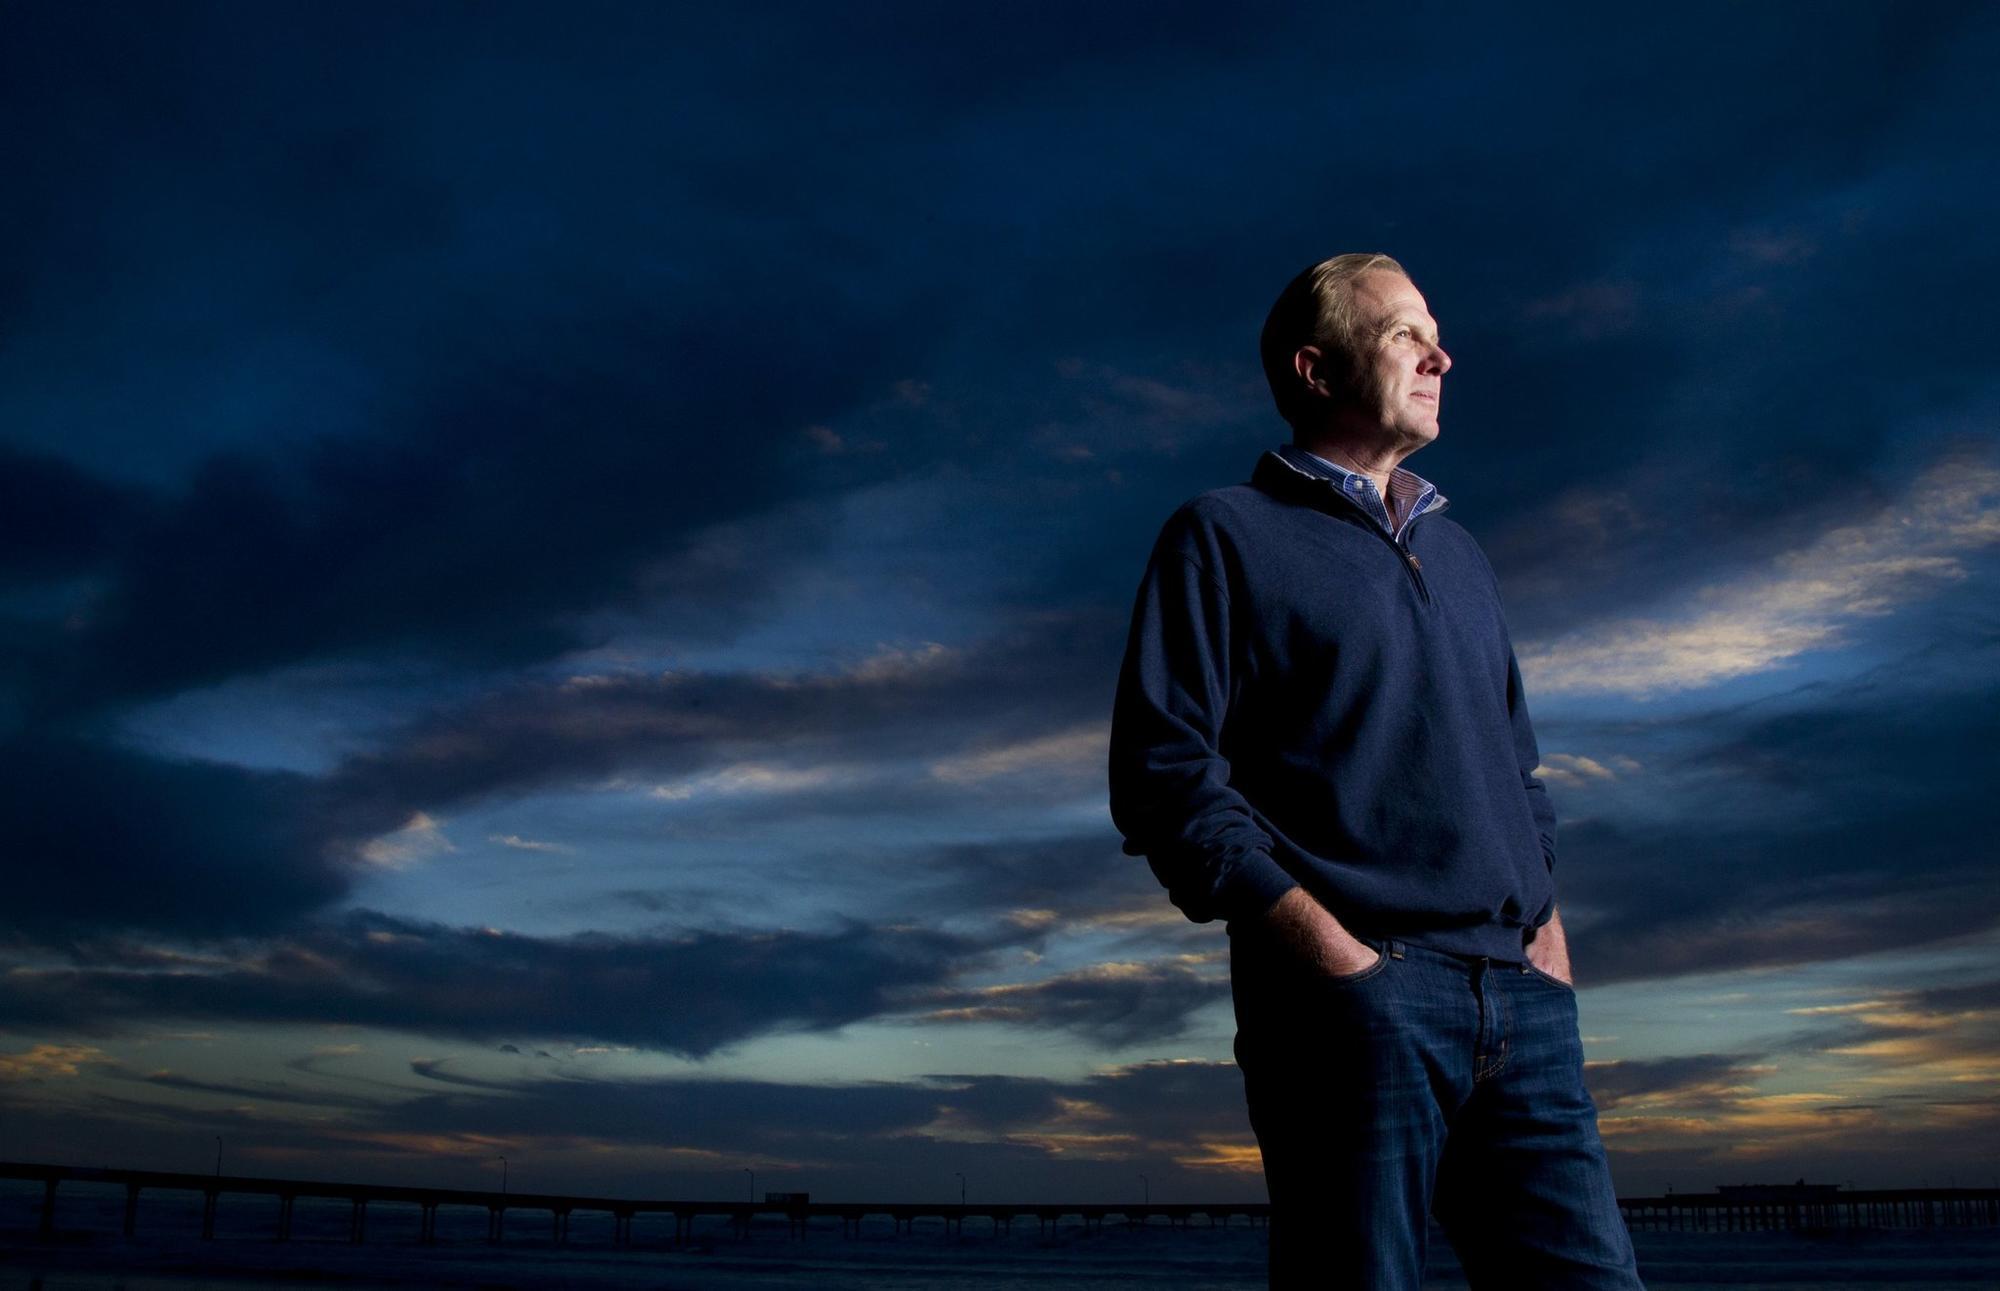 San Diego's 36th mayor